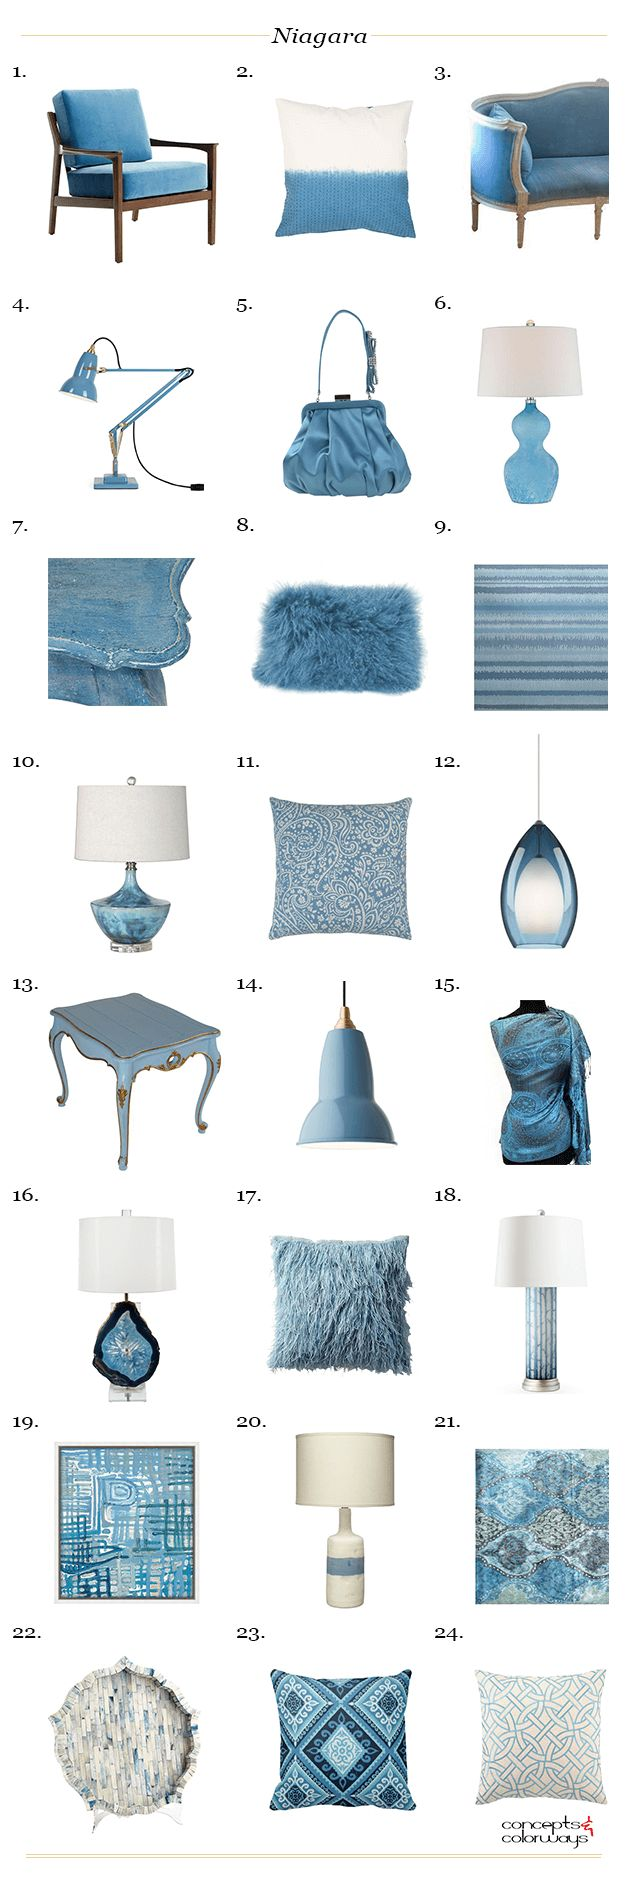 pantone niagara interior design product roundup, get the look, dusty blue, slate blue, smoky blue, denim blue, french blue